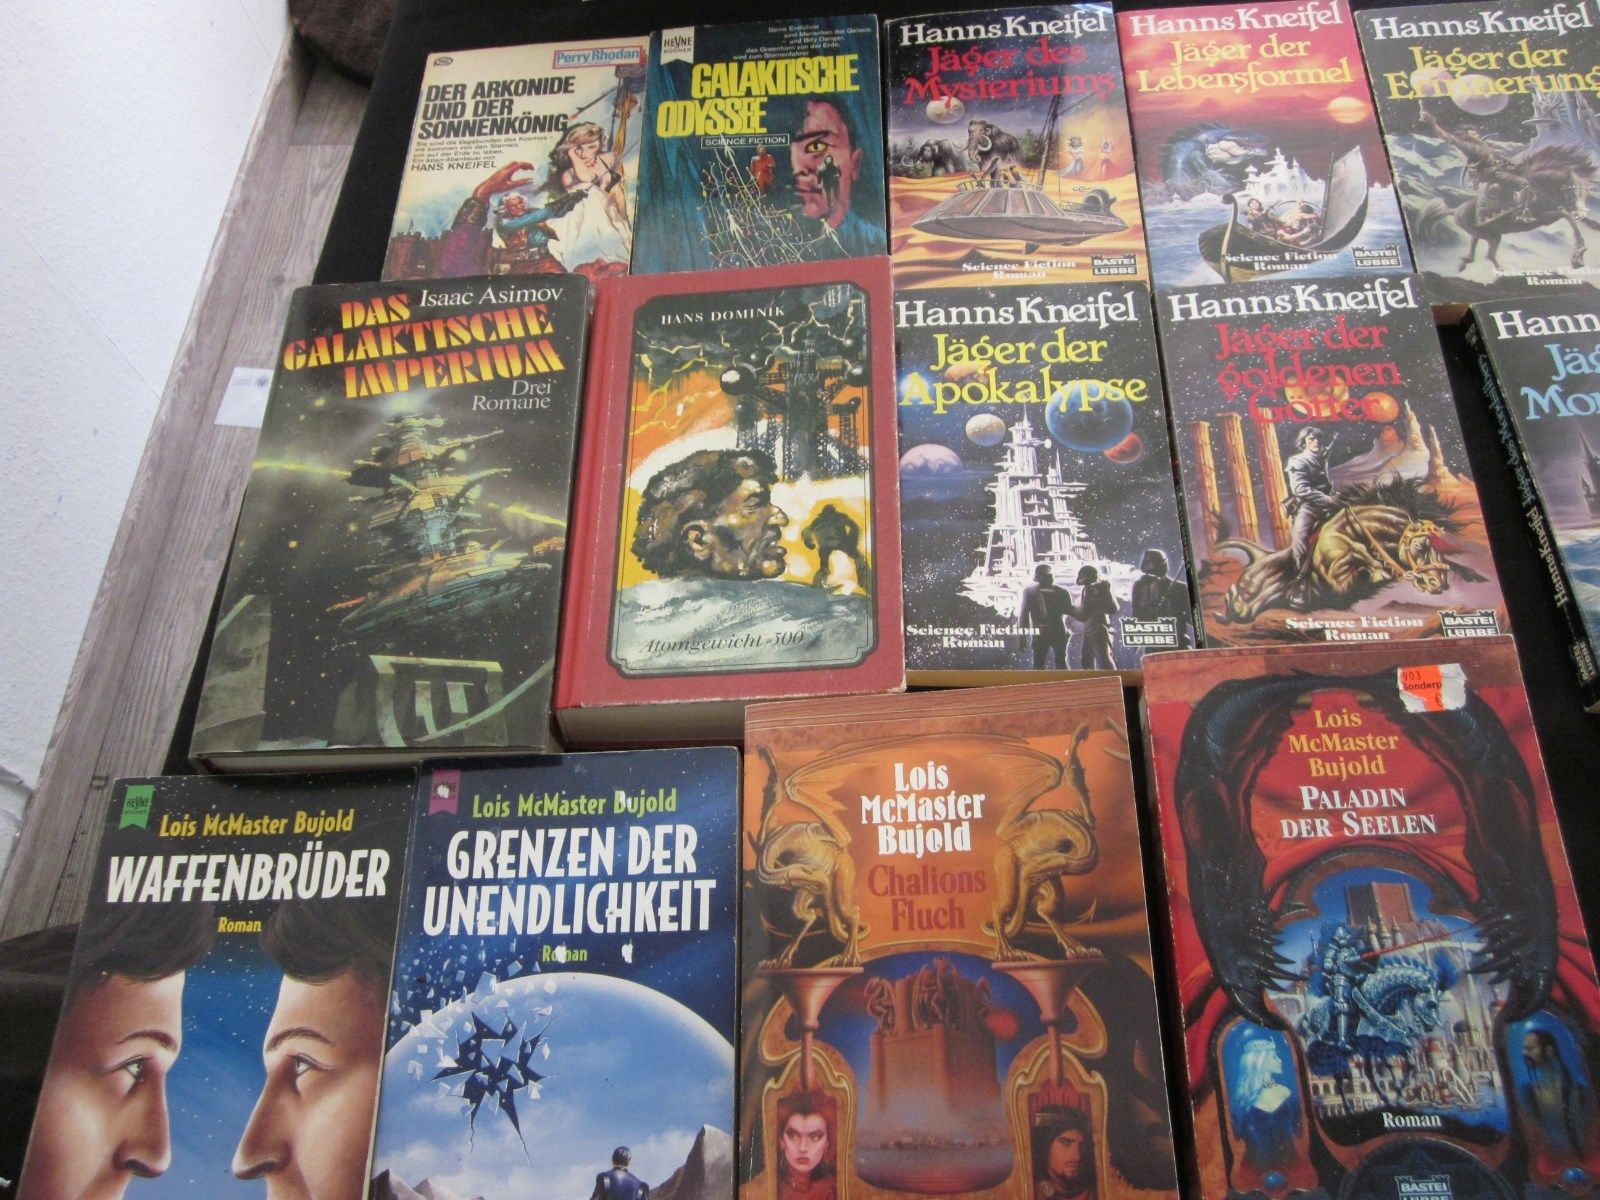 32 Science Fiktion Bücher-Kneifel,Laumer,Bujold , Asimov usw